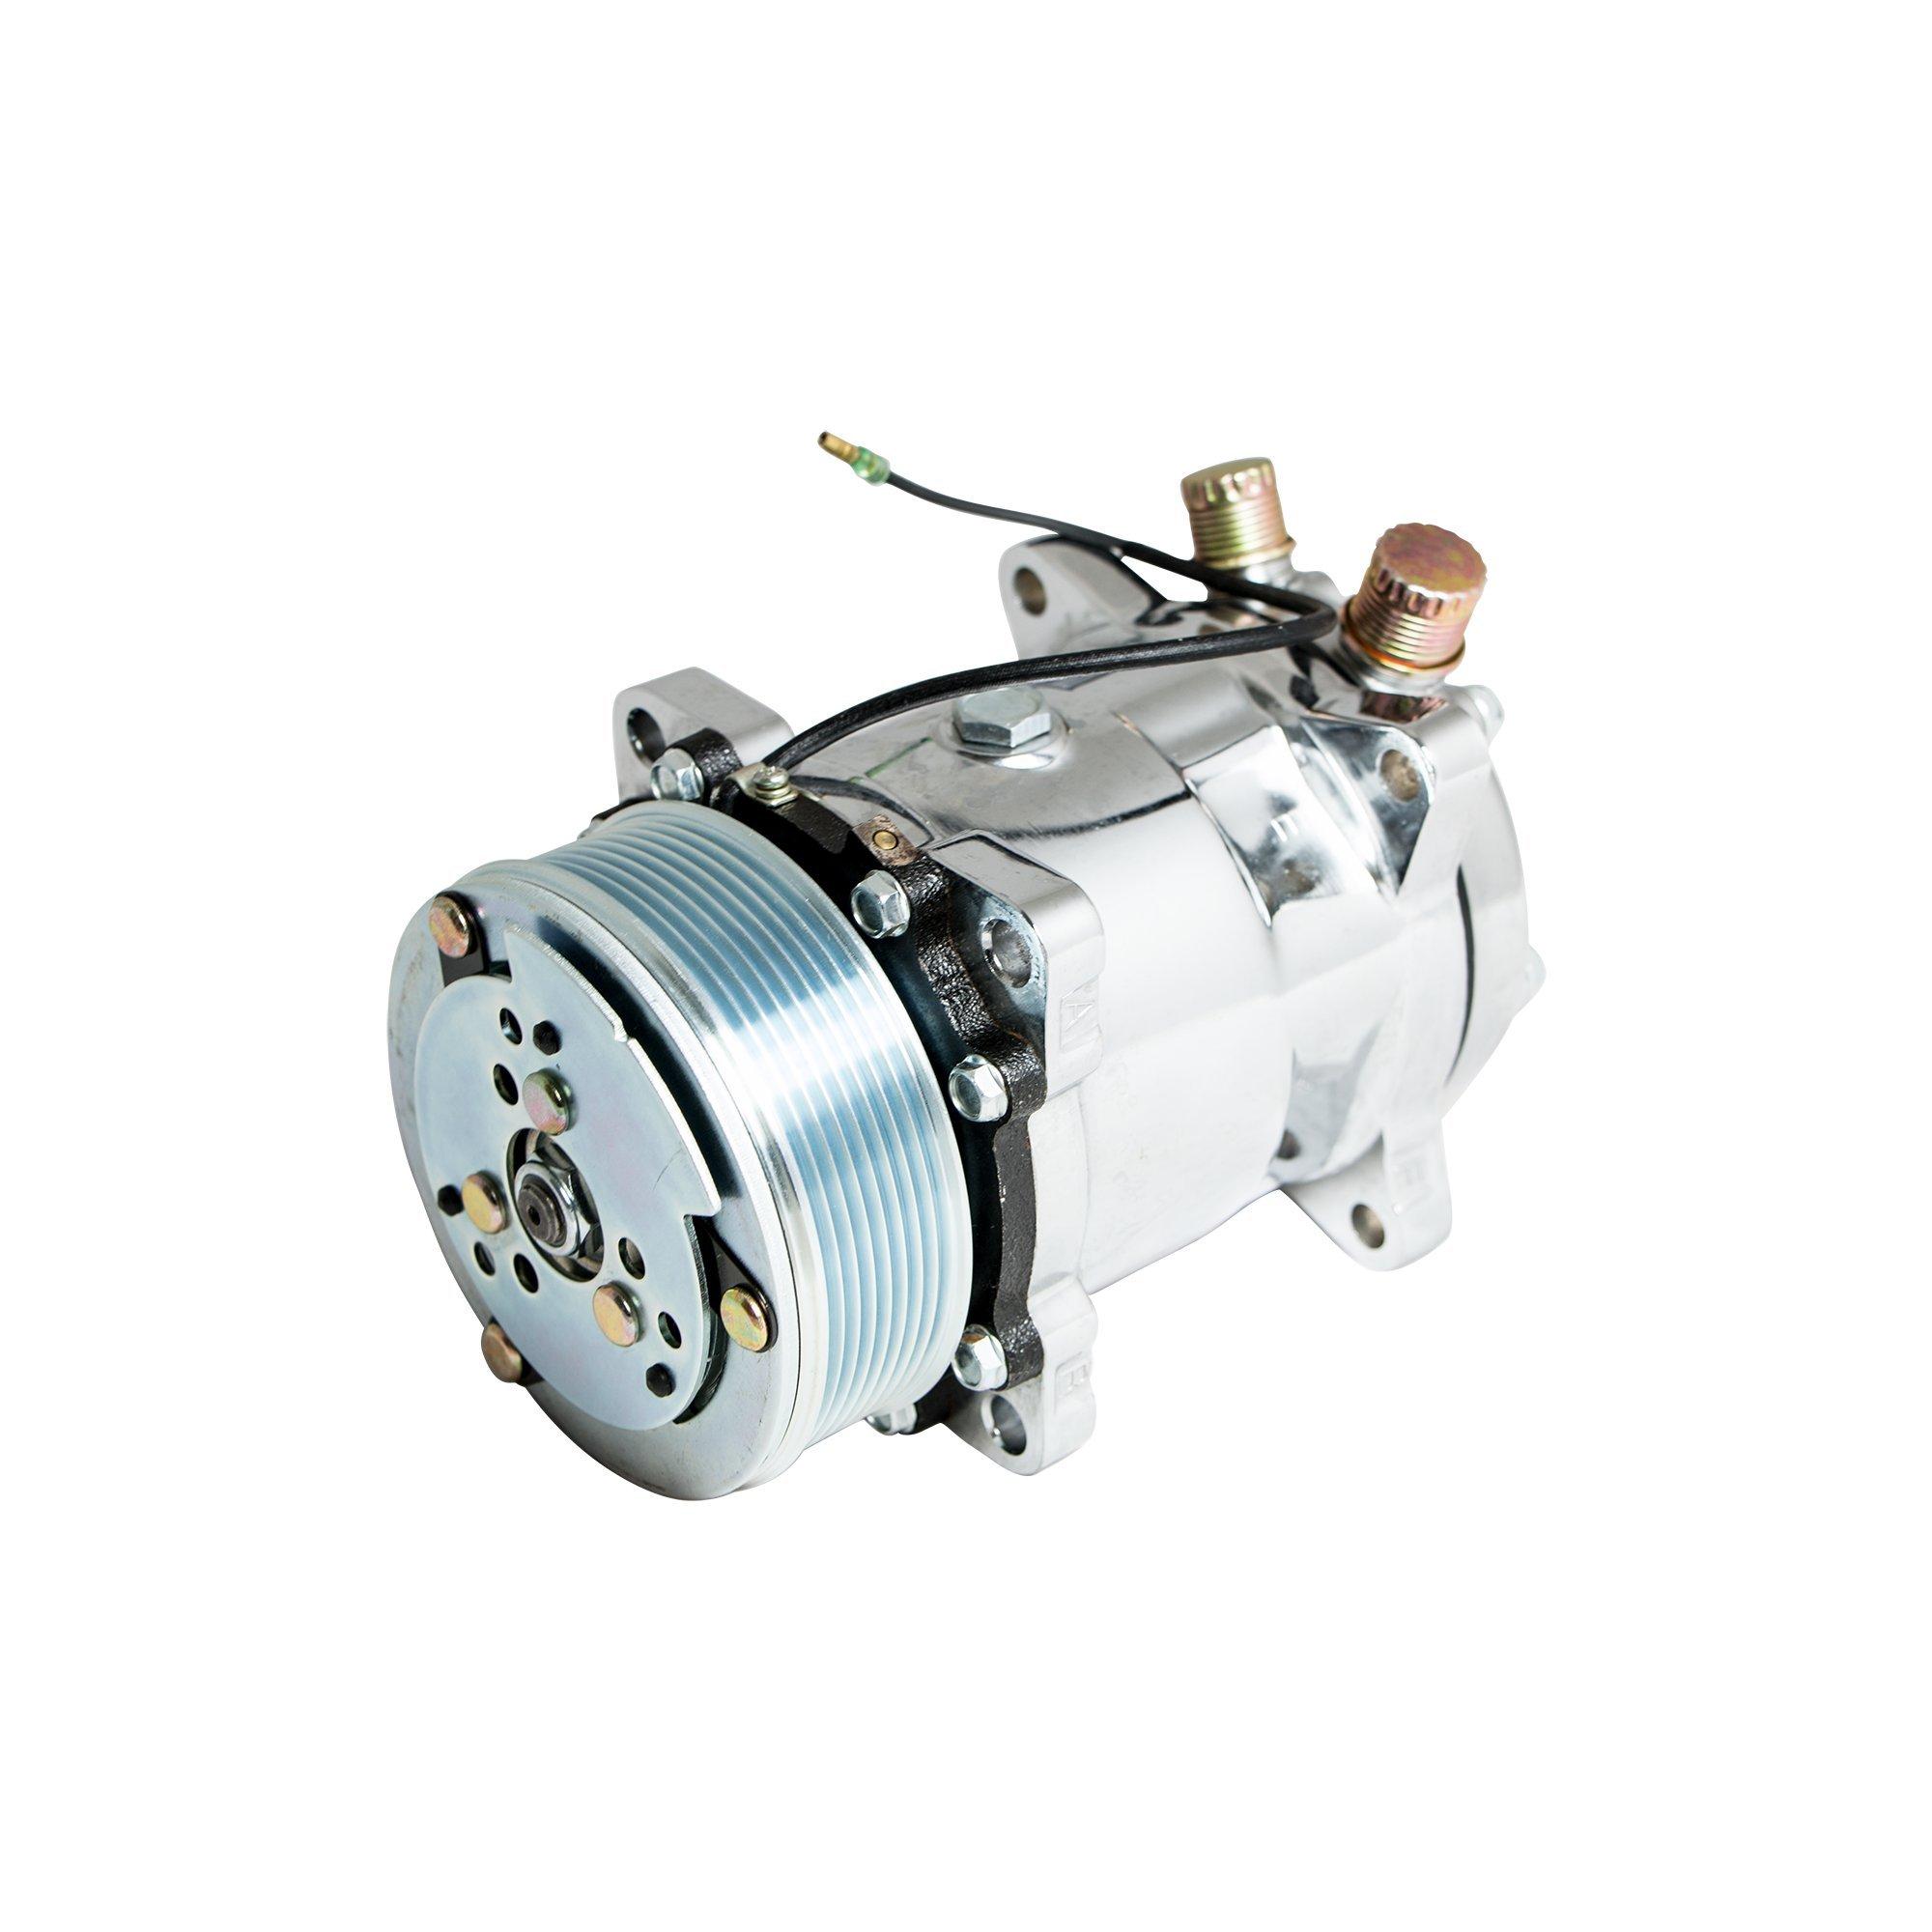 Top Street Performance HC5004C A/C Compressor with Silver Clutch (Chromed Serpentine-Belt Sanden 508 R134A Type)